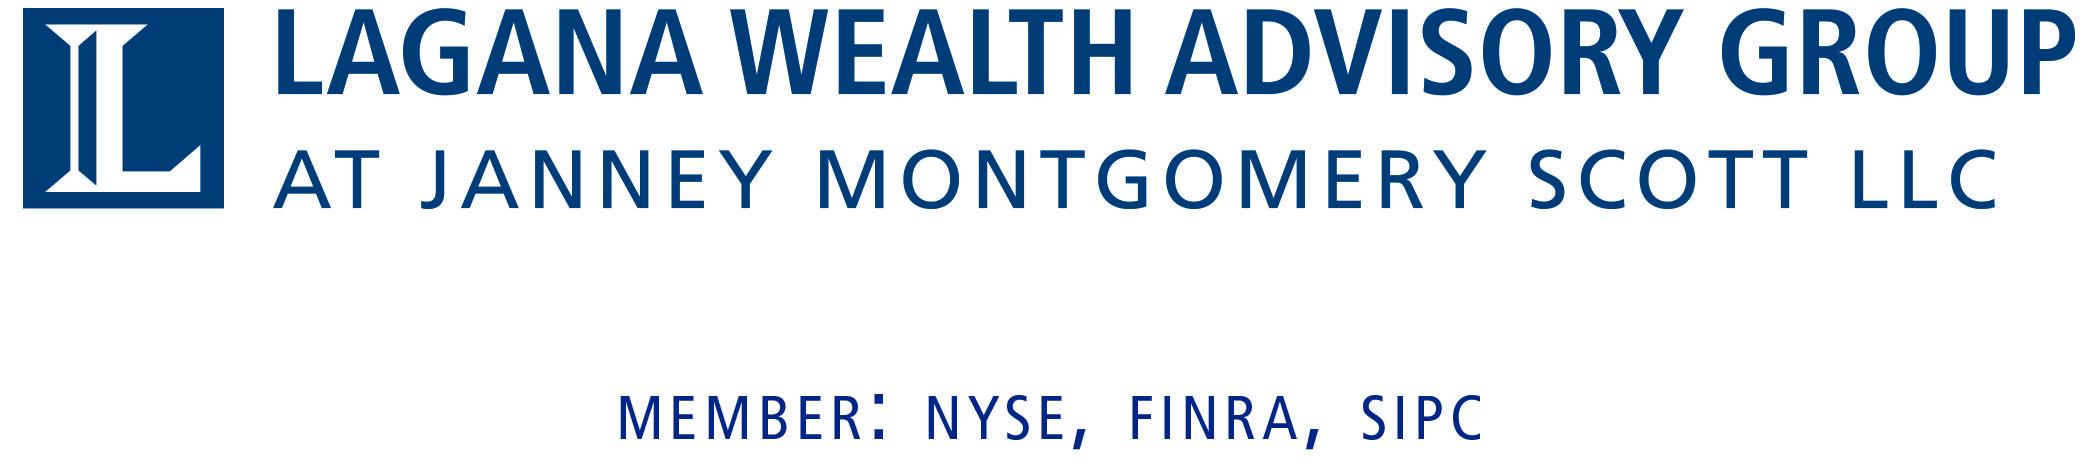 Lagana Wealth Advisory Group Profile Photo